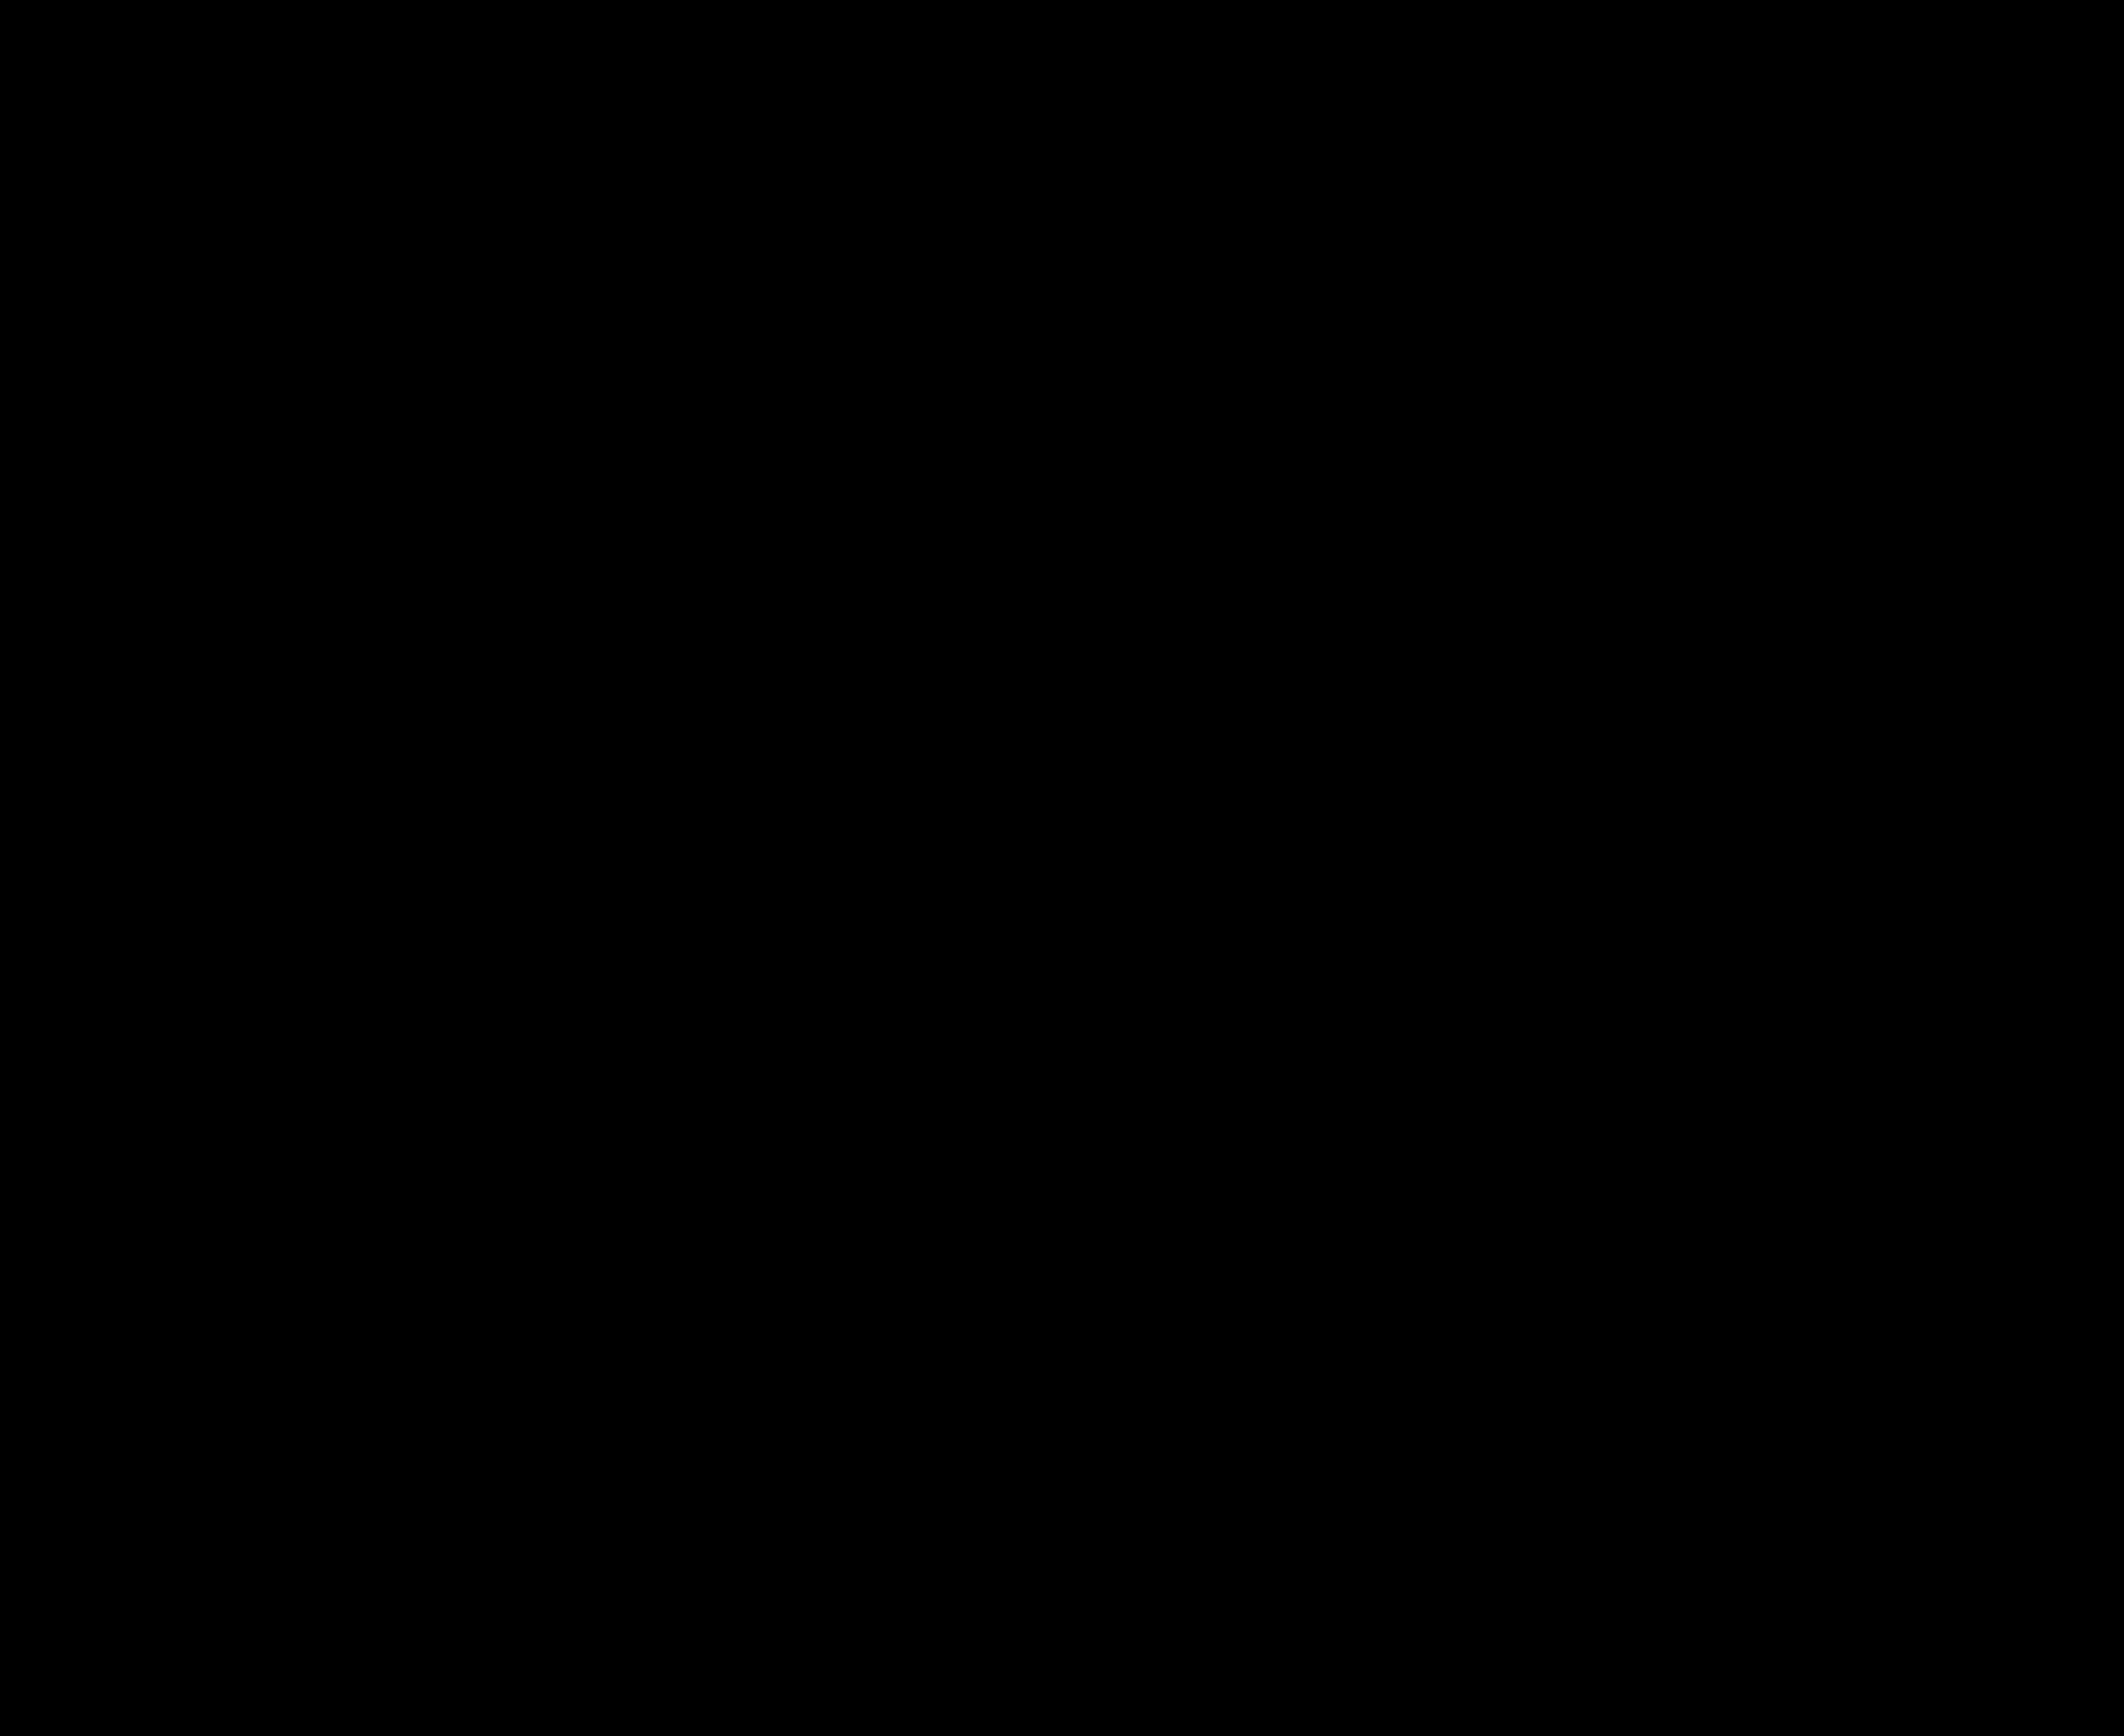 Horseshoe Vector Clipart image.